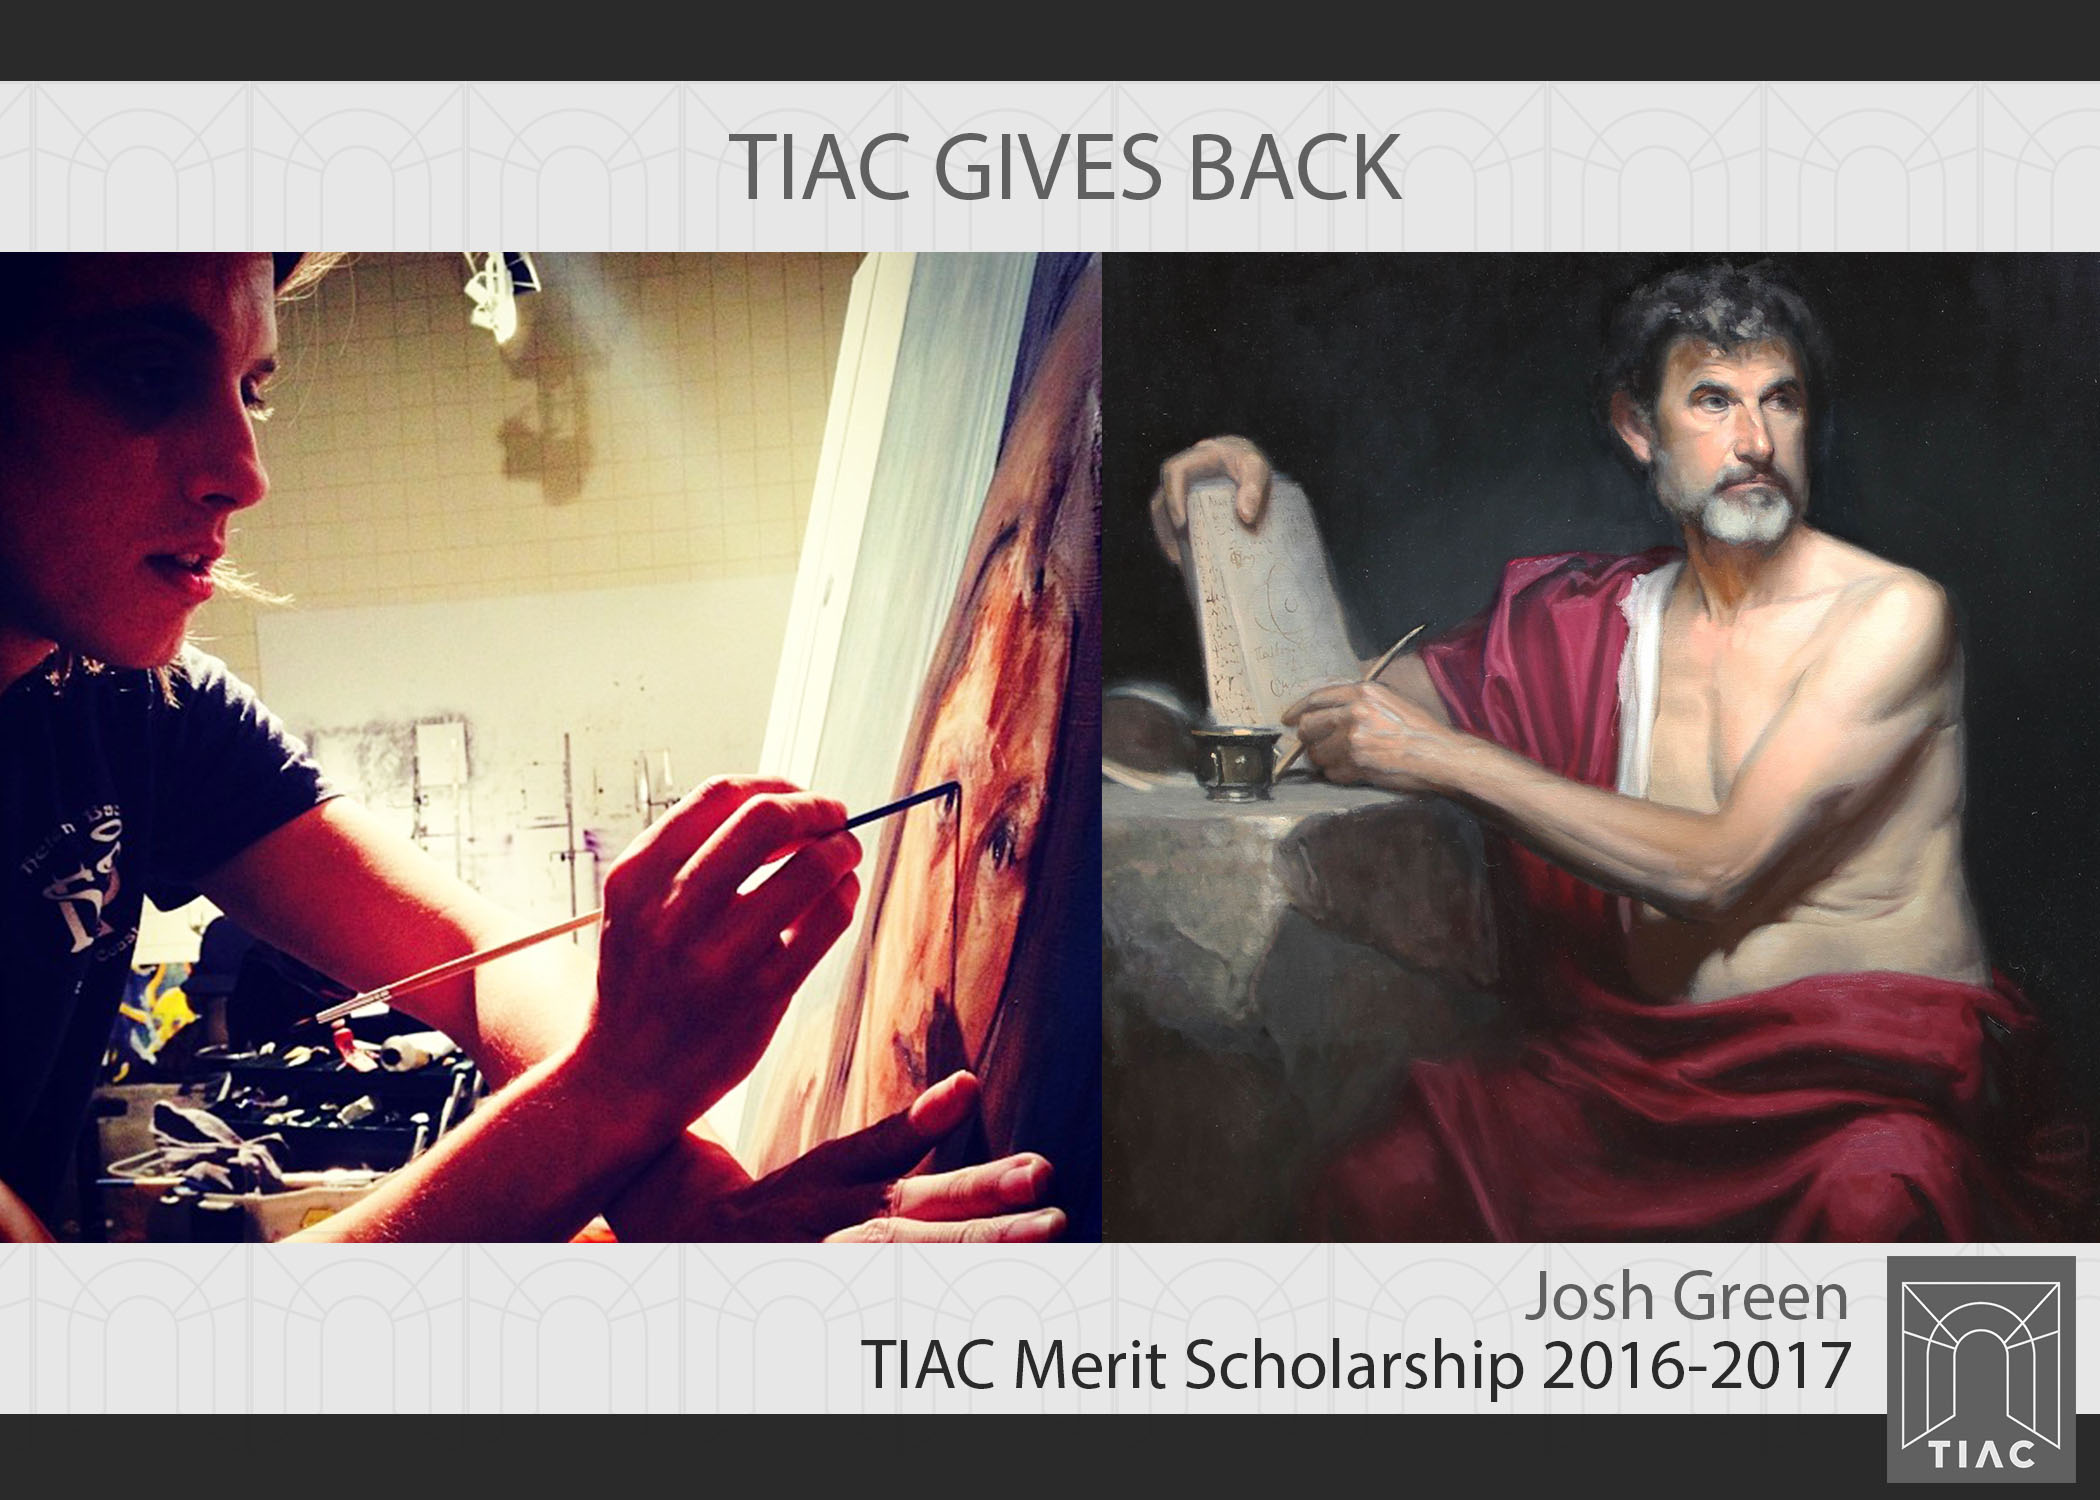 TIAc-Gives_Back_Scholarships_Josh Green.jpg